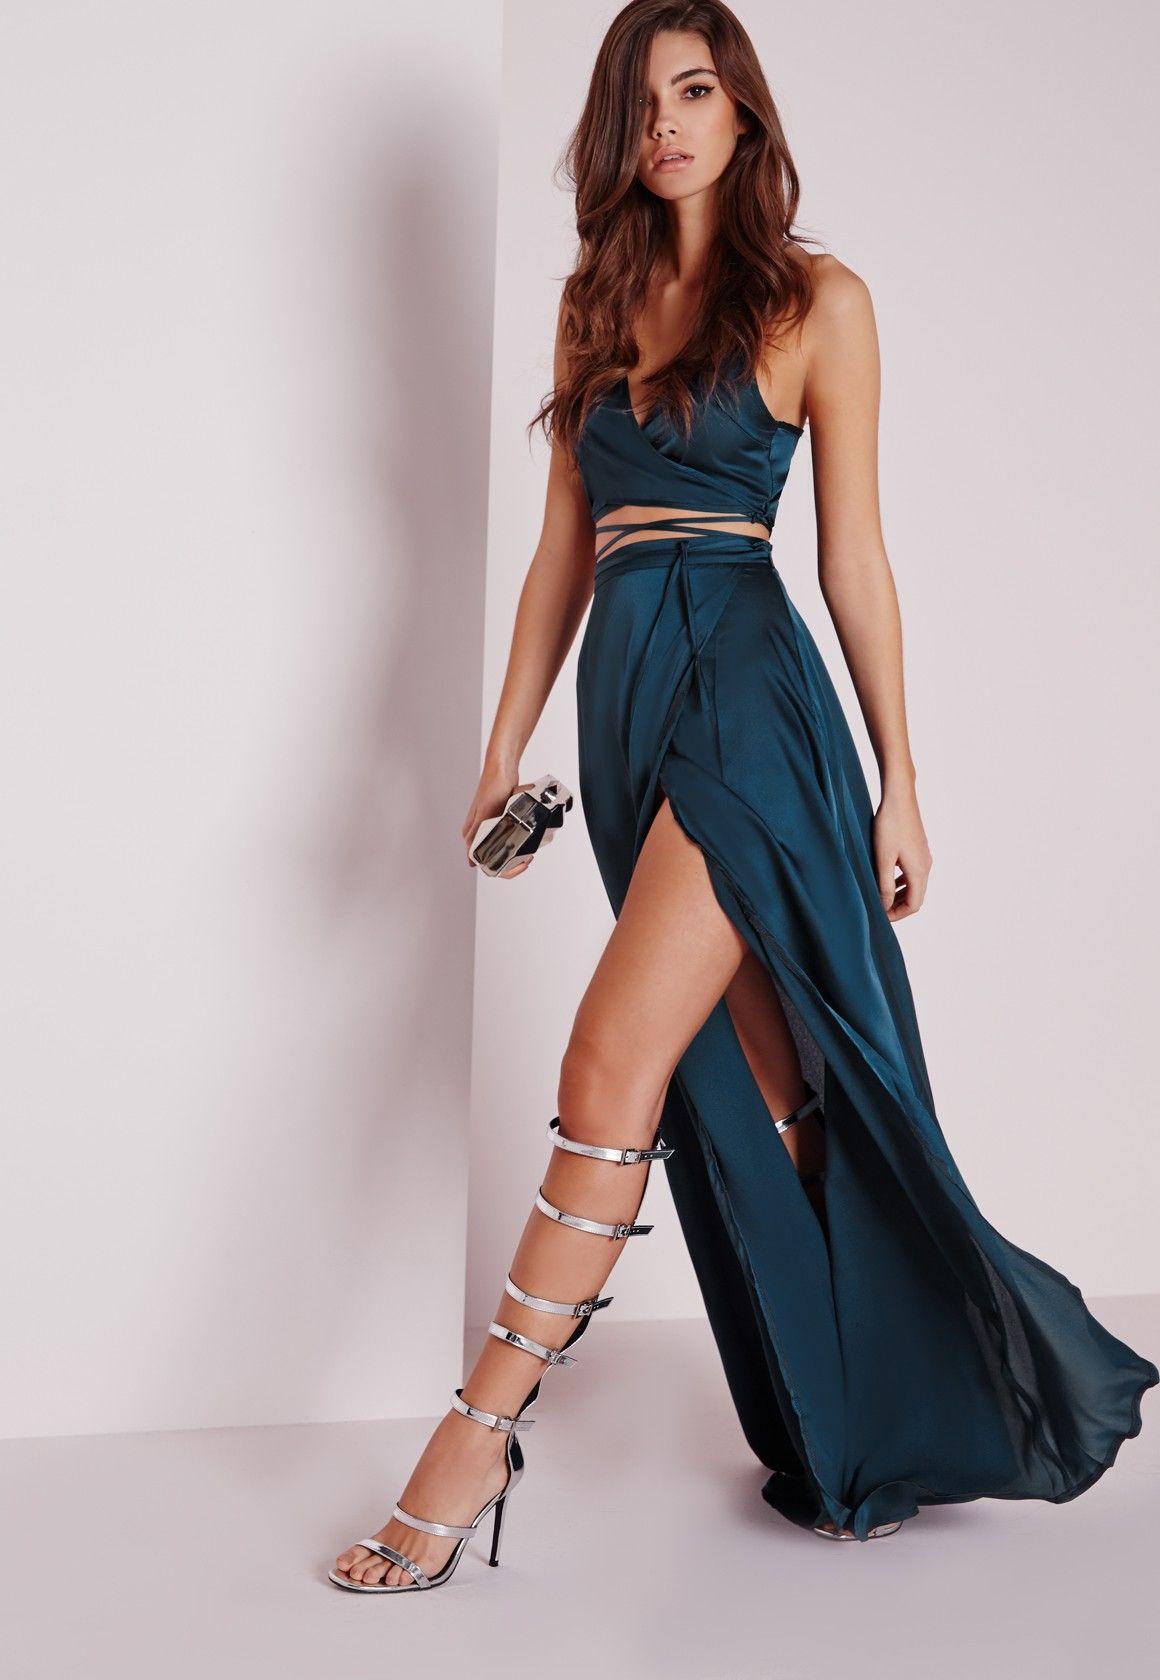 Long dark green dress  Satin Wrap Maxi Skirt Teal  Skirts  CoOrds  Missguided  dresses